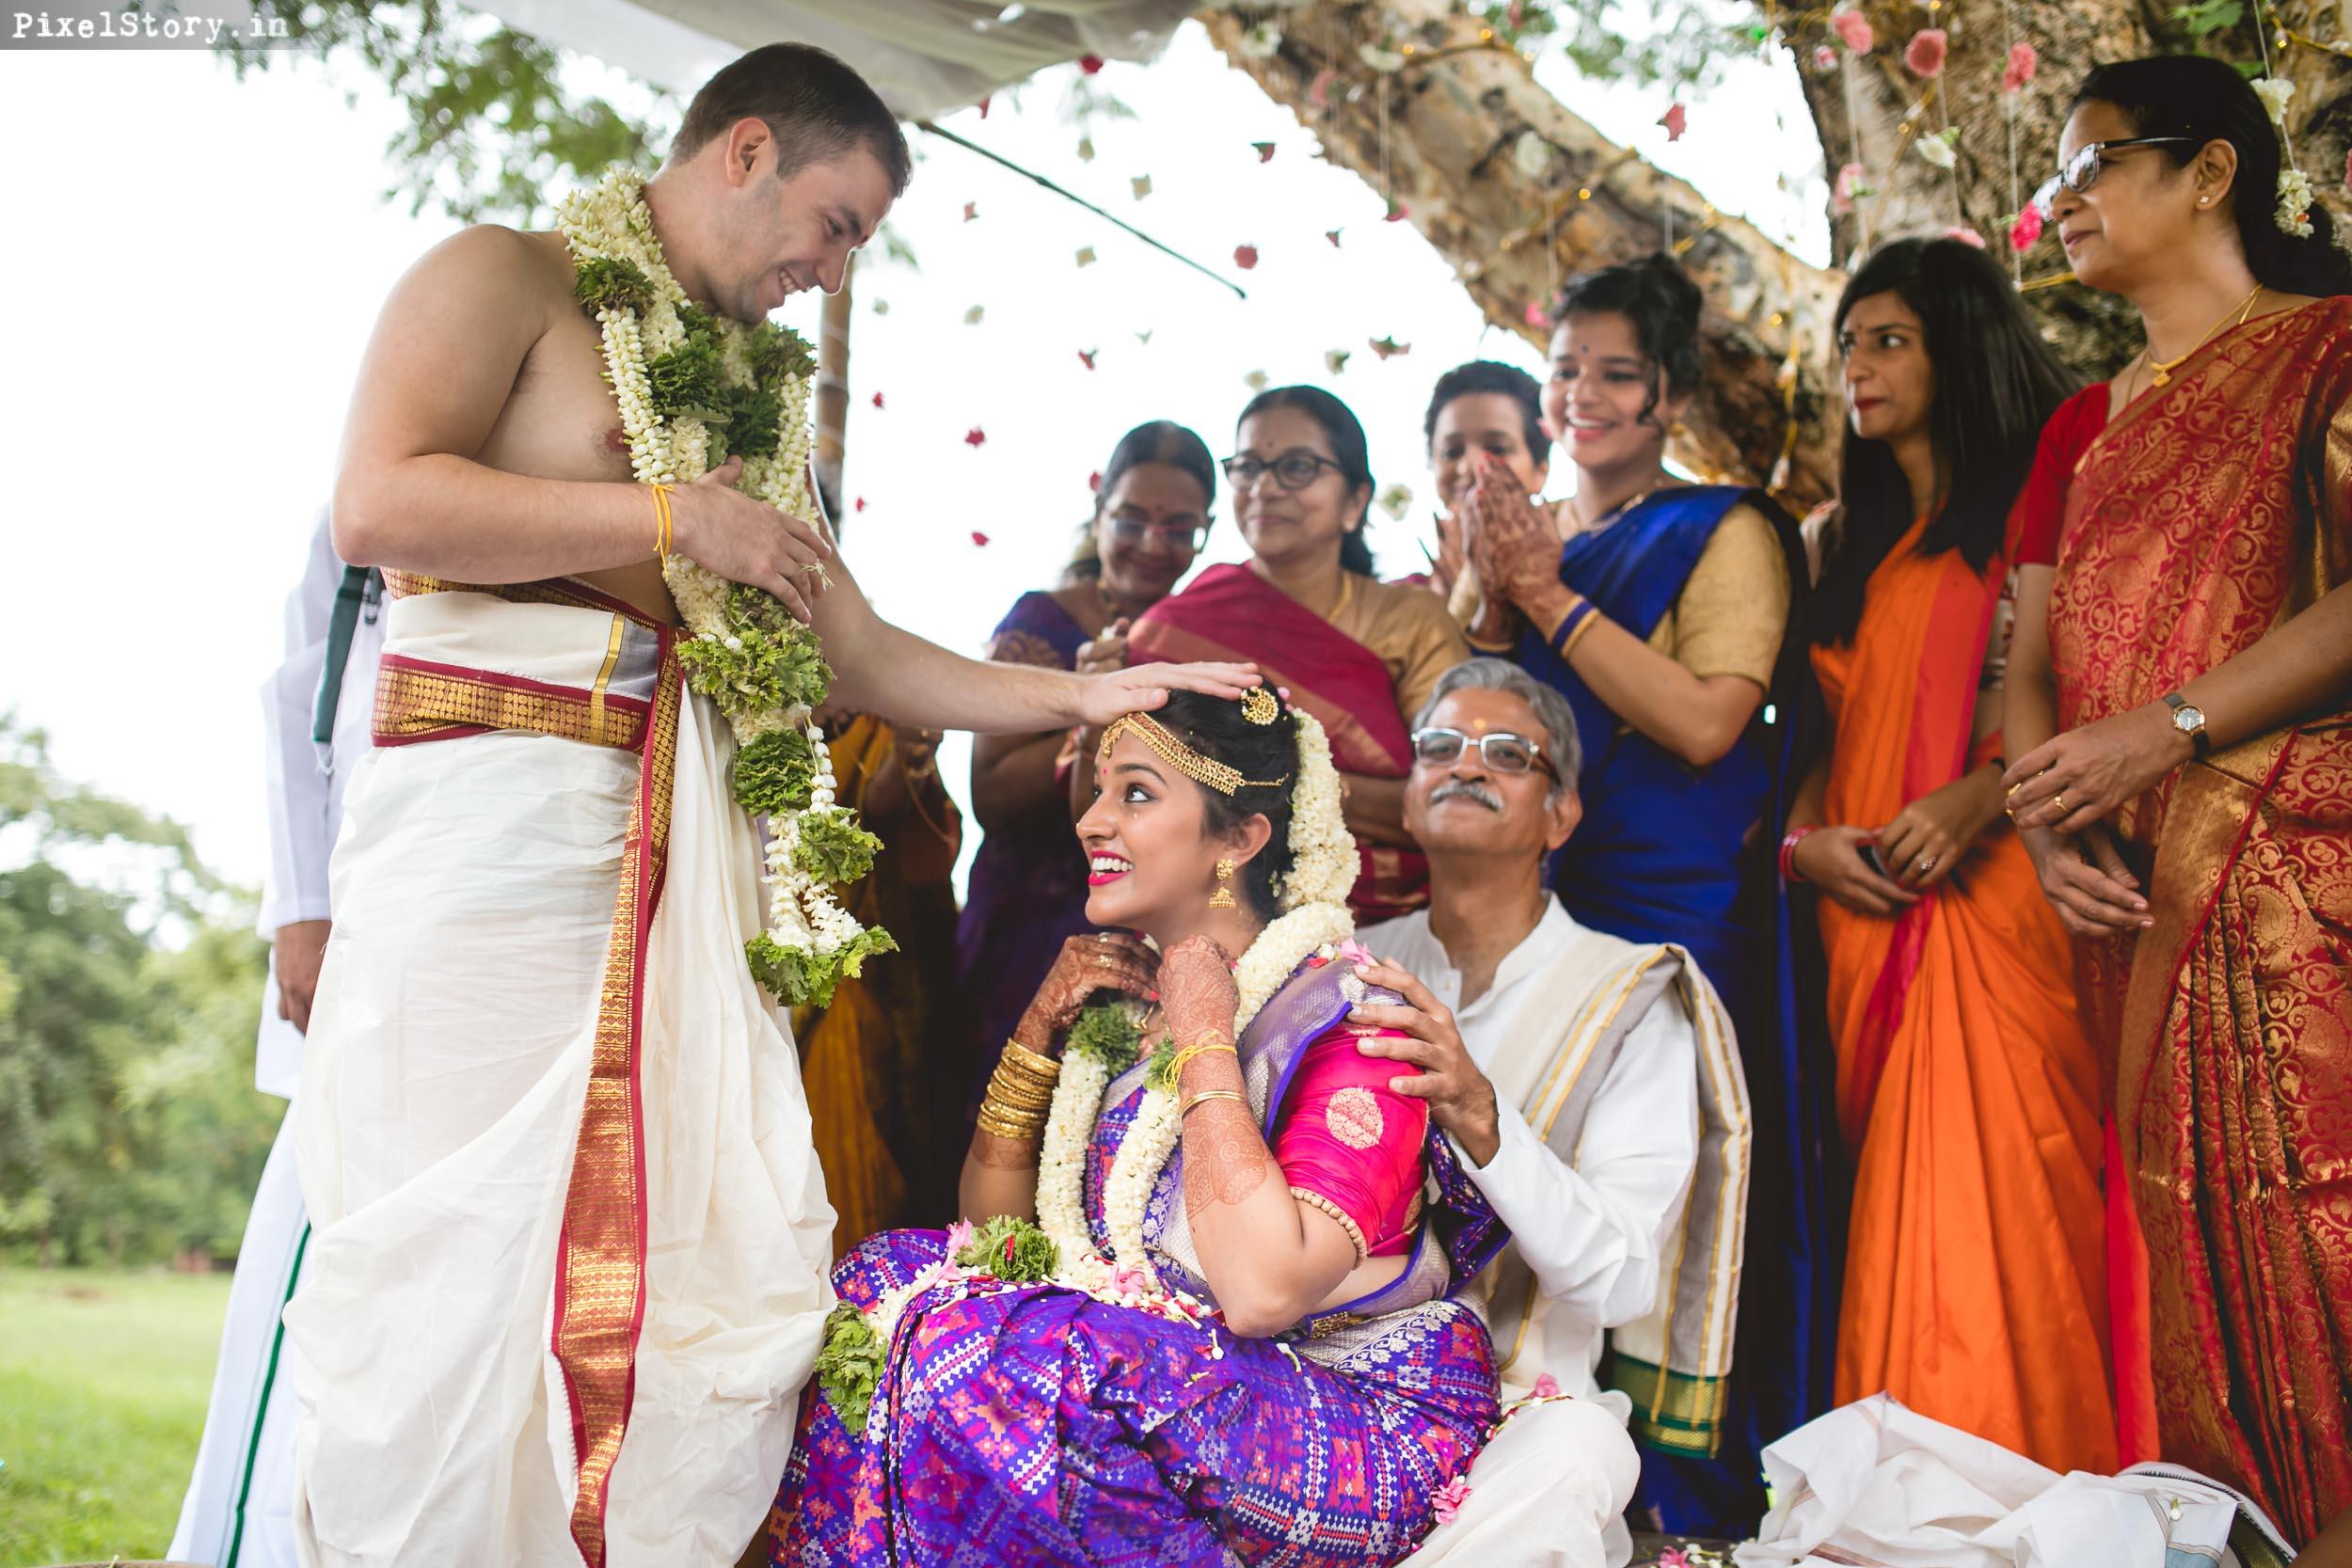 PixelStory-Jungle-Wedding-Photographer-Masinagudi-Indo-French067.jpg